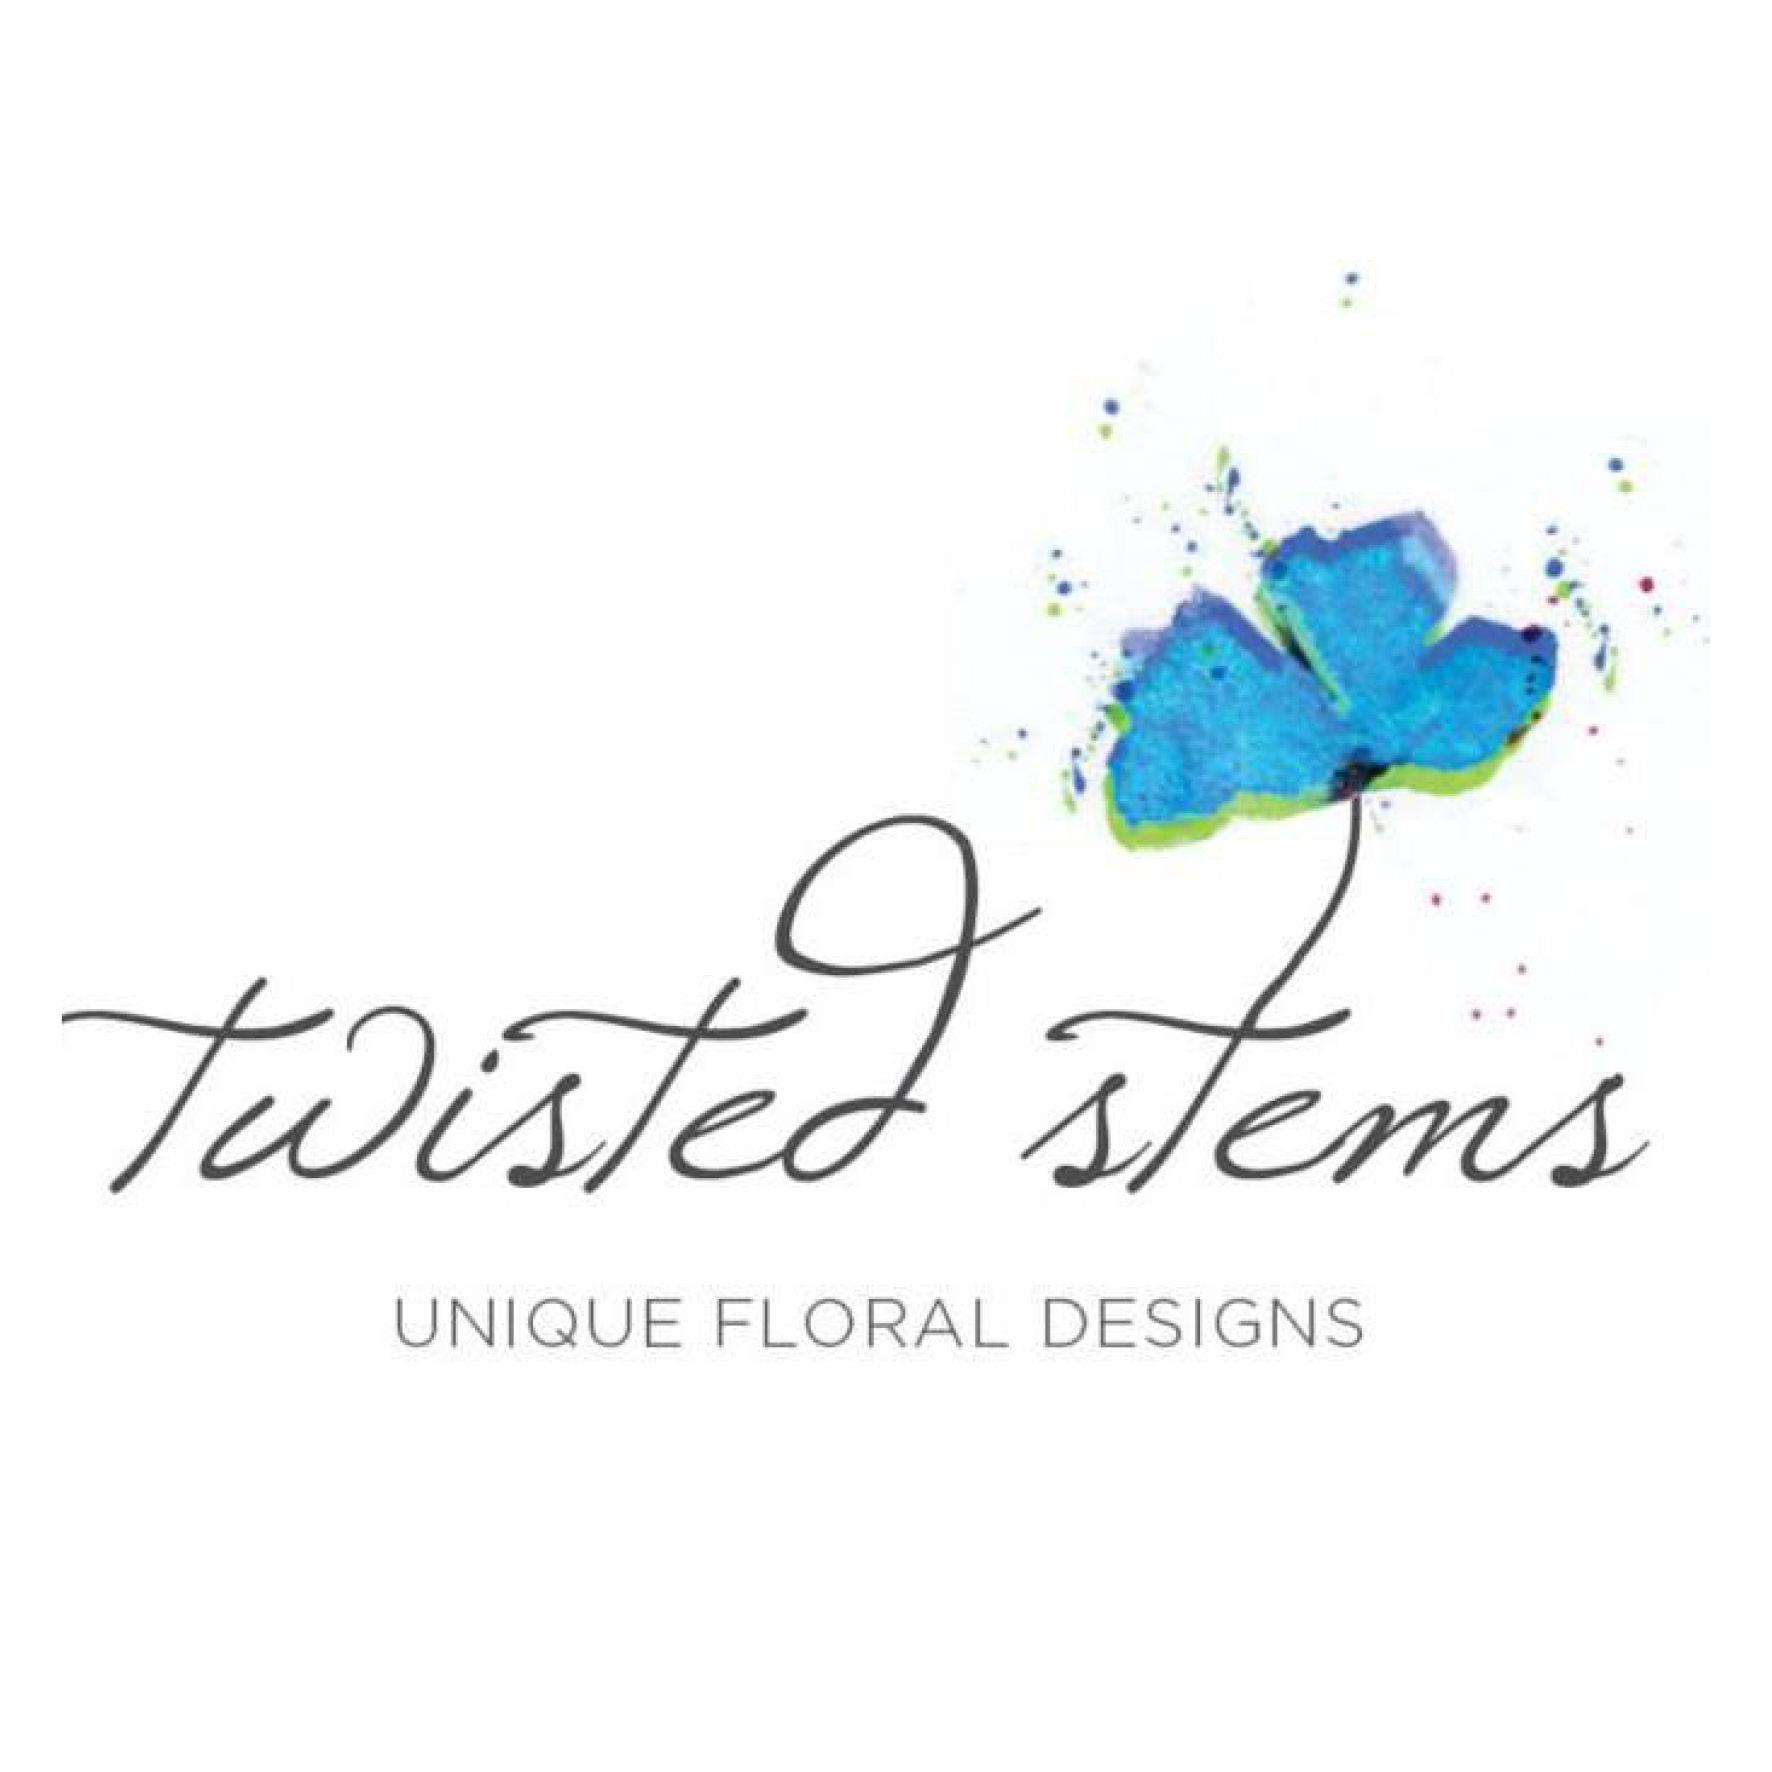 twisted-stems-florists